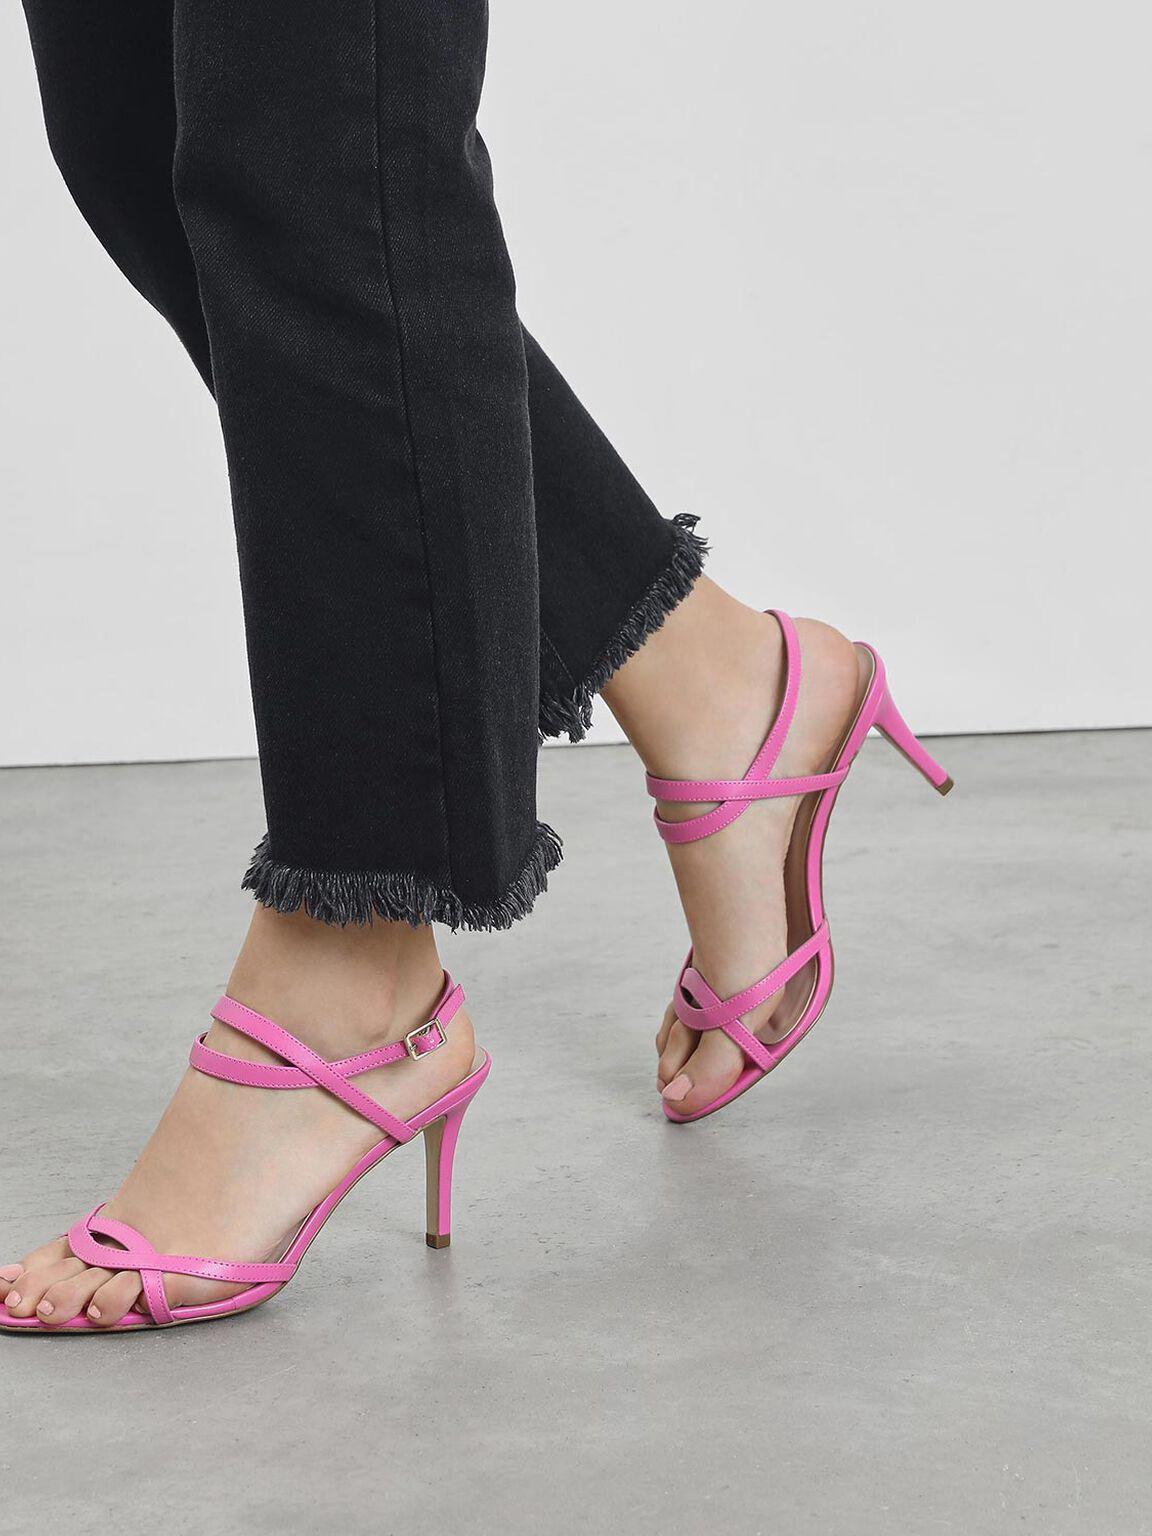 Criss-Cross Strappy Slingback Heels, Fuchsia, hi-res